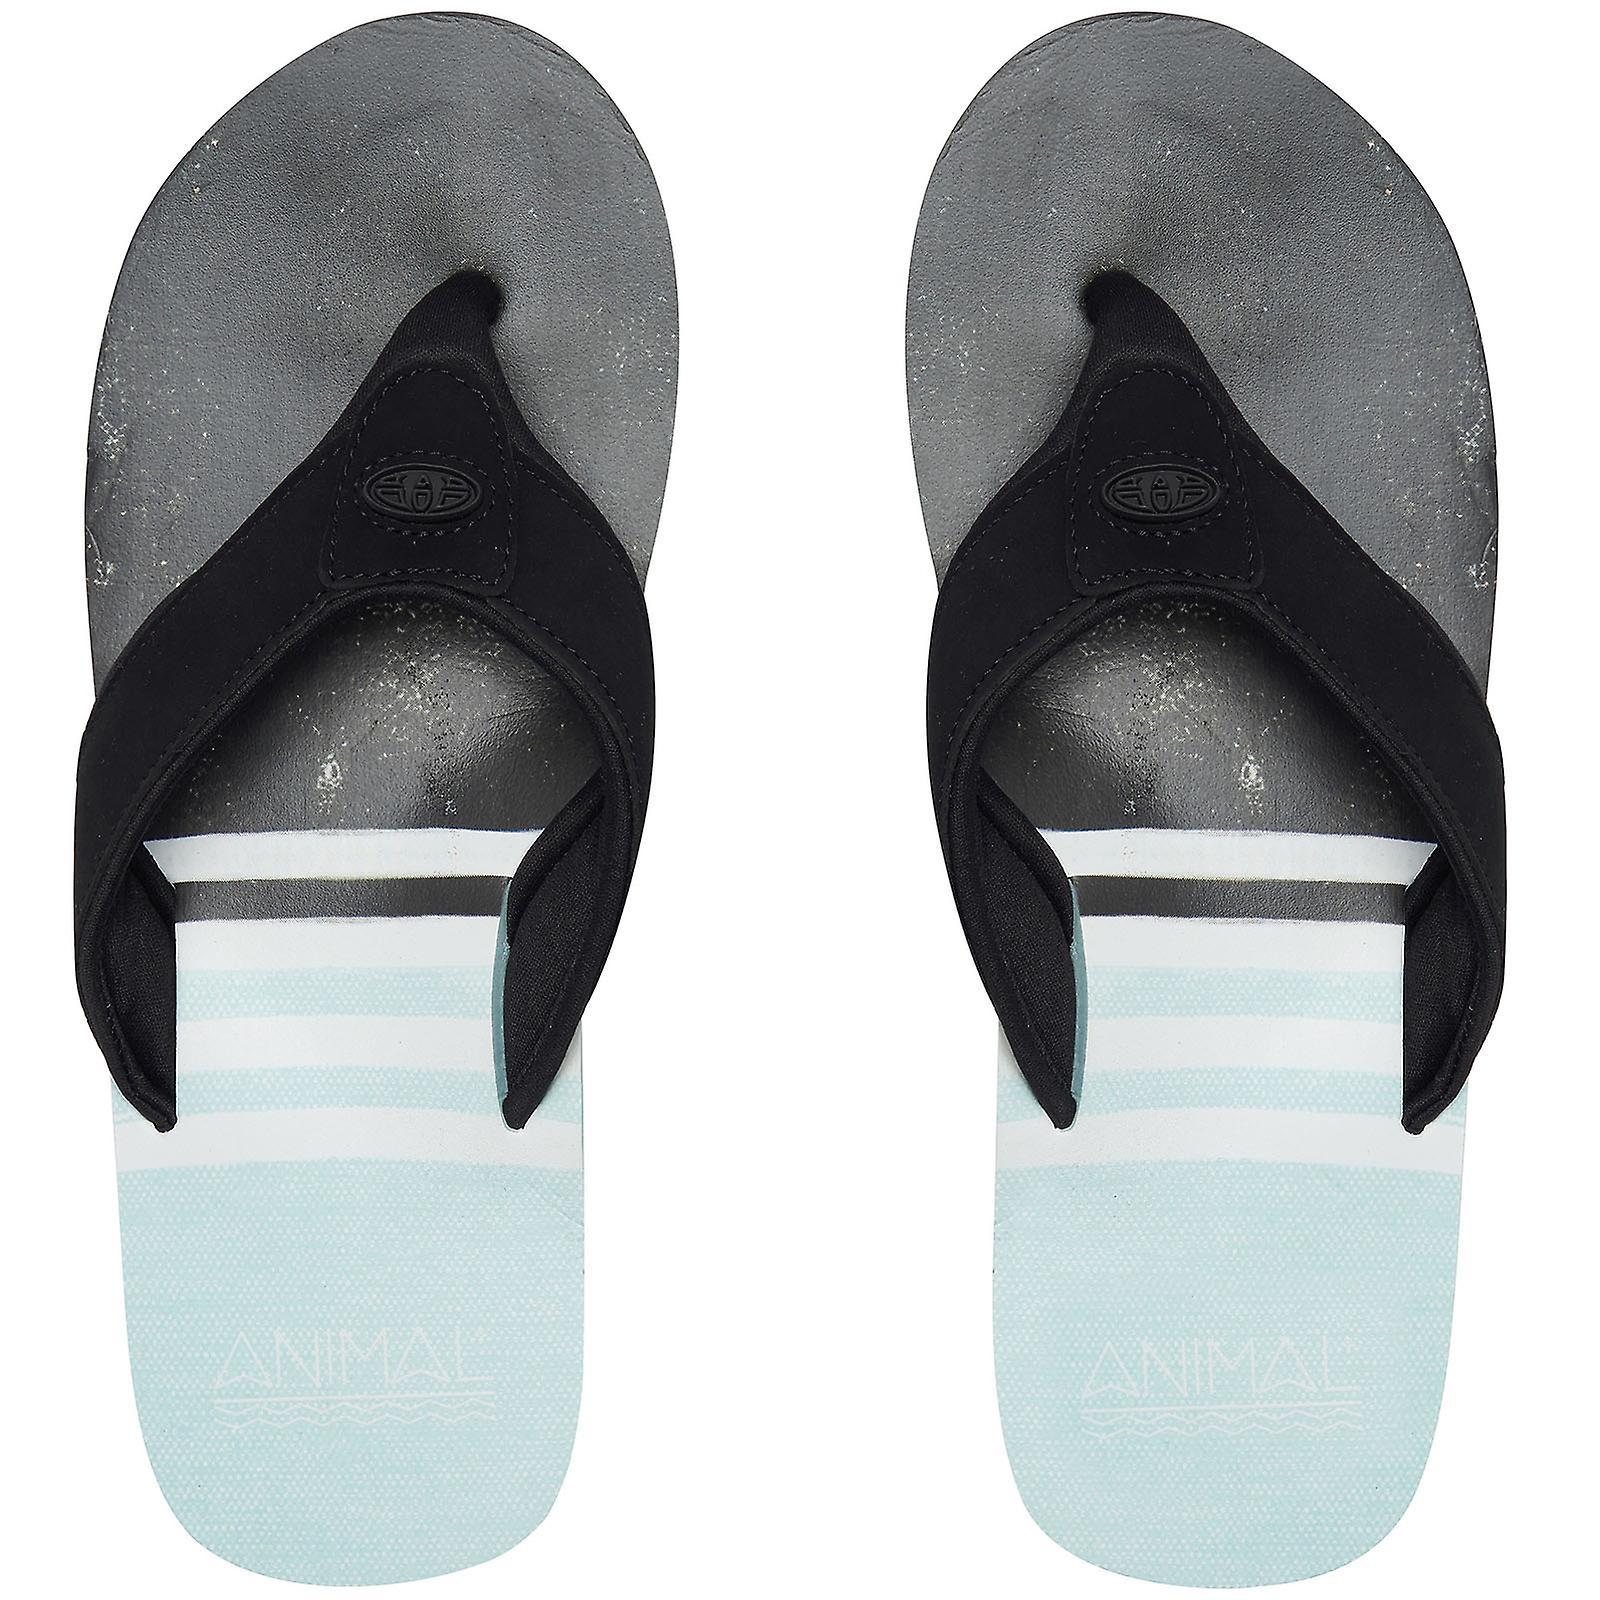 Animal Mens Jekyl Swim Summer Beach Holiday Thongs Sandals Flip Flops